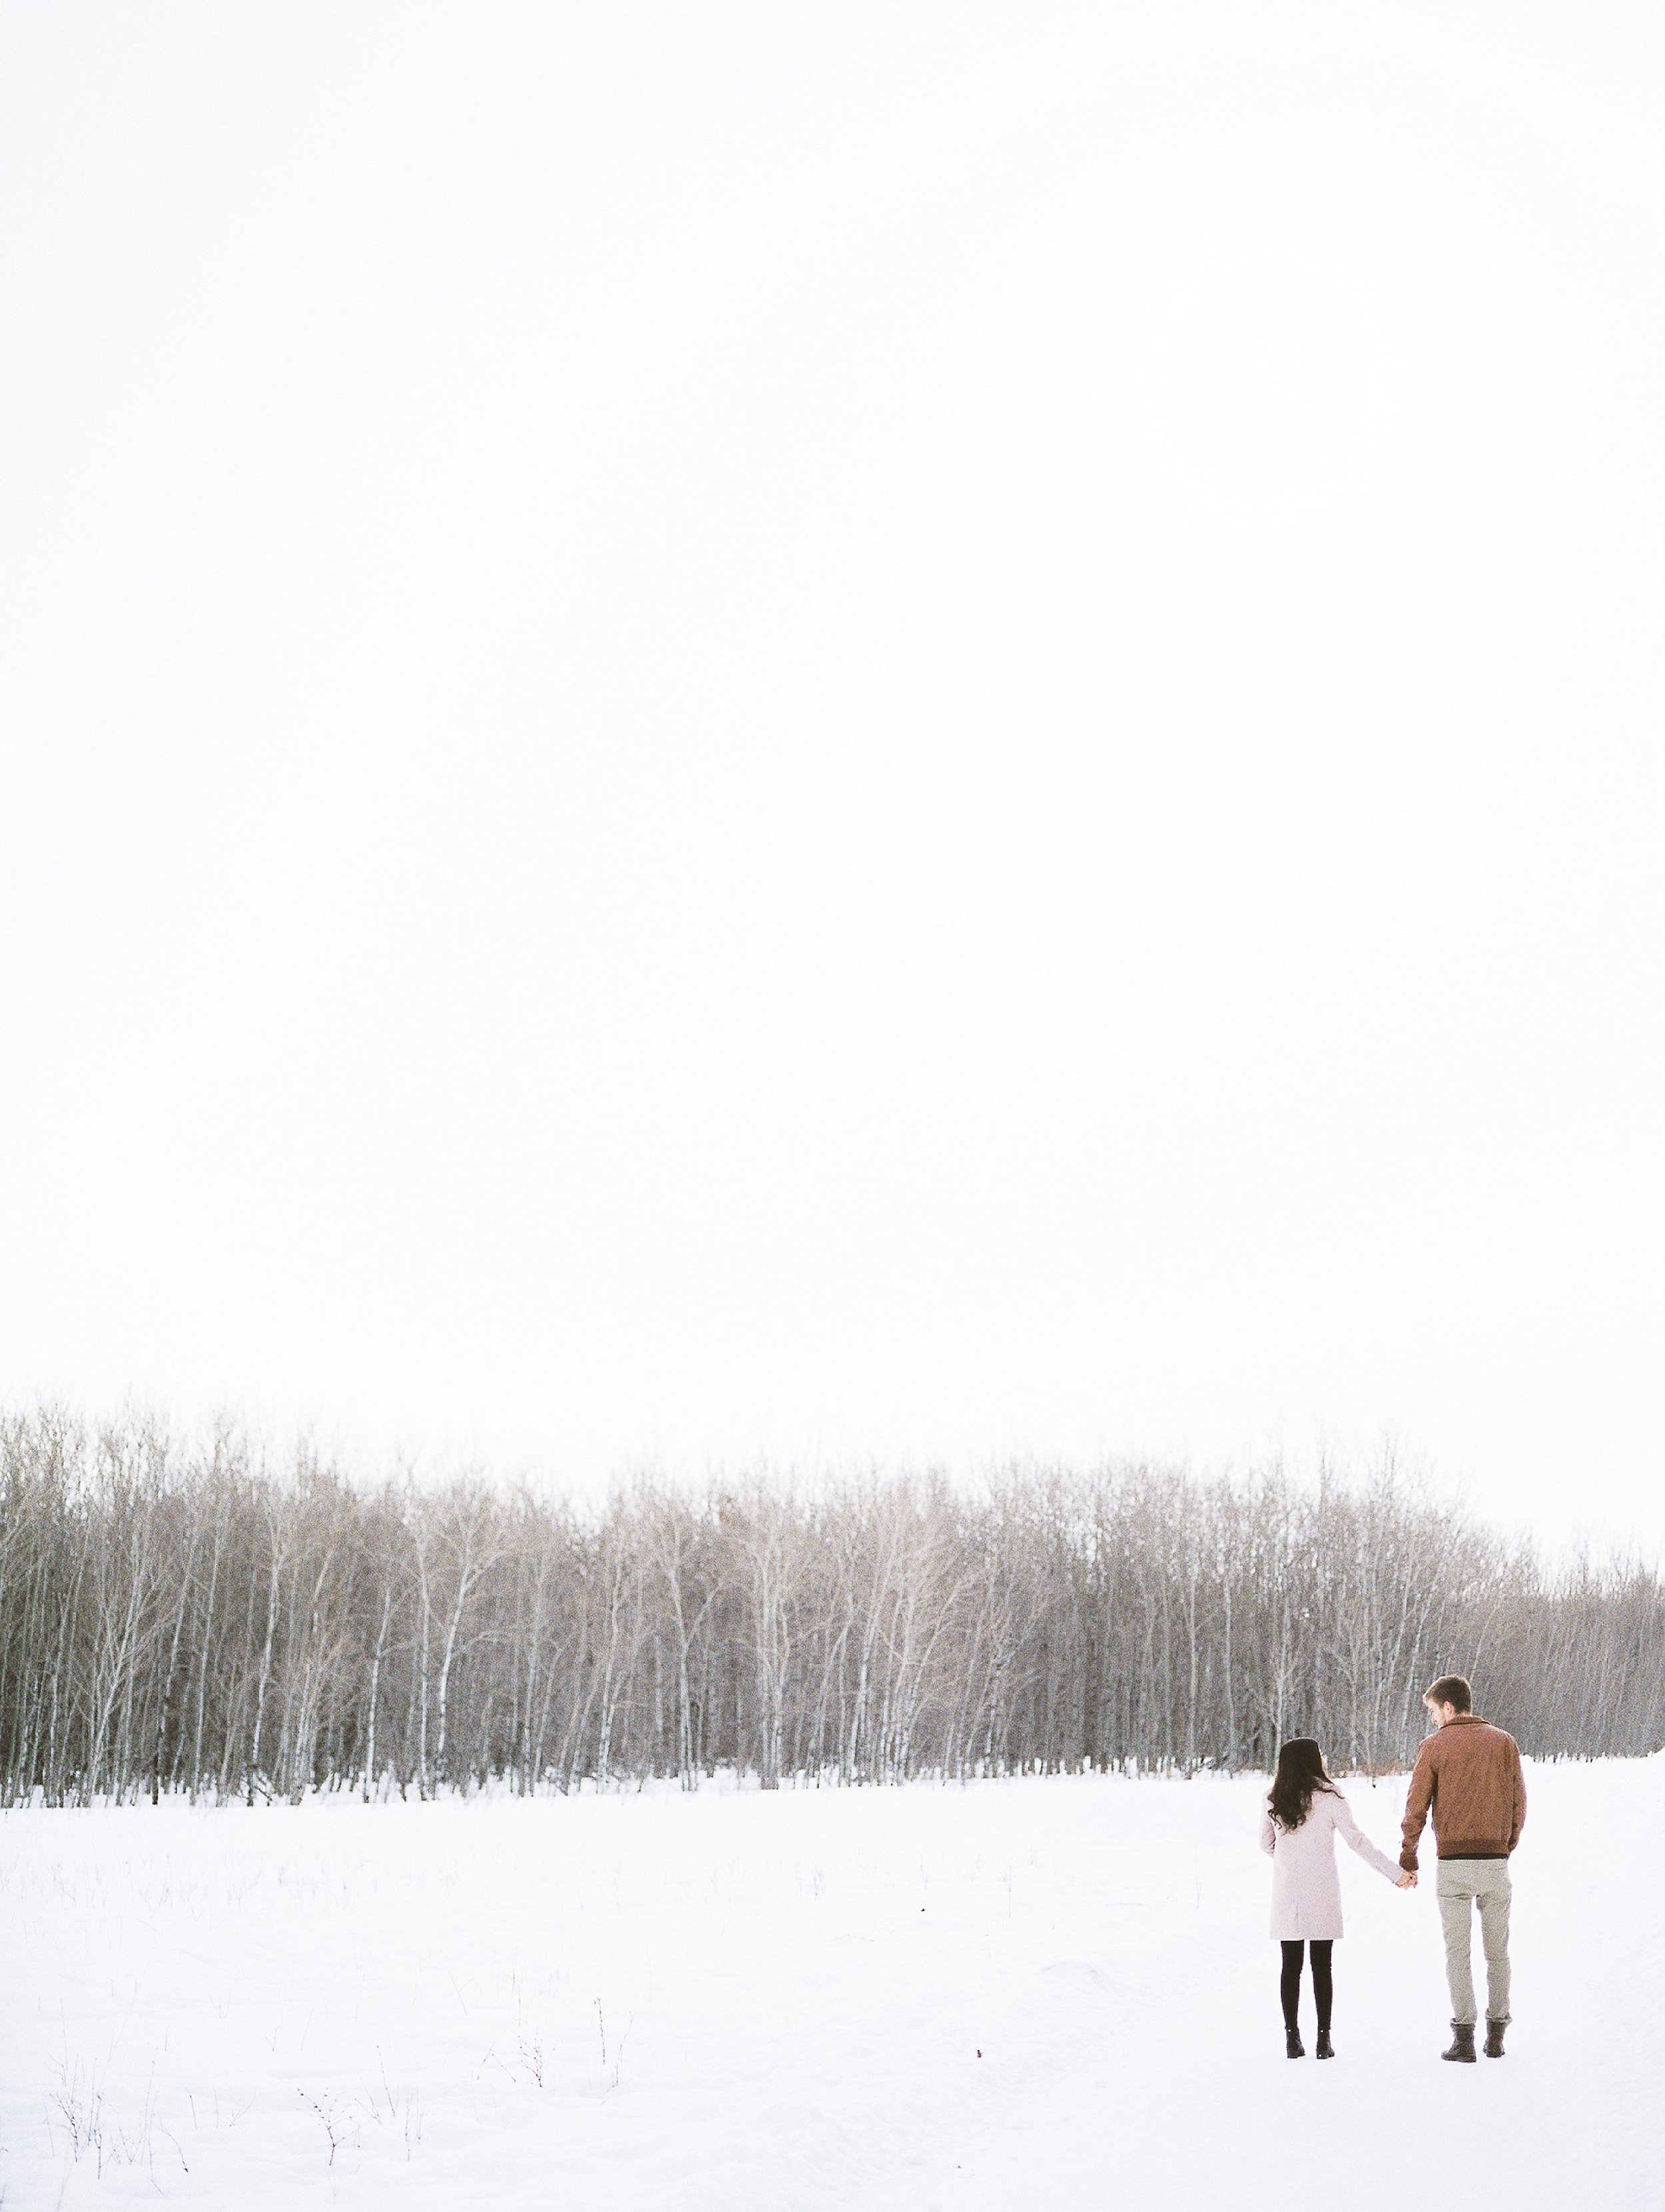 Assiniboine-Forest-Engagement-Session-Location-Idea-Winnipeg-Manitoba-Wedding-Photographer